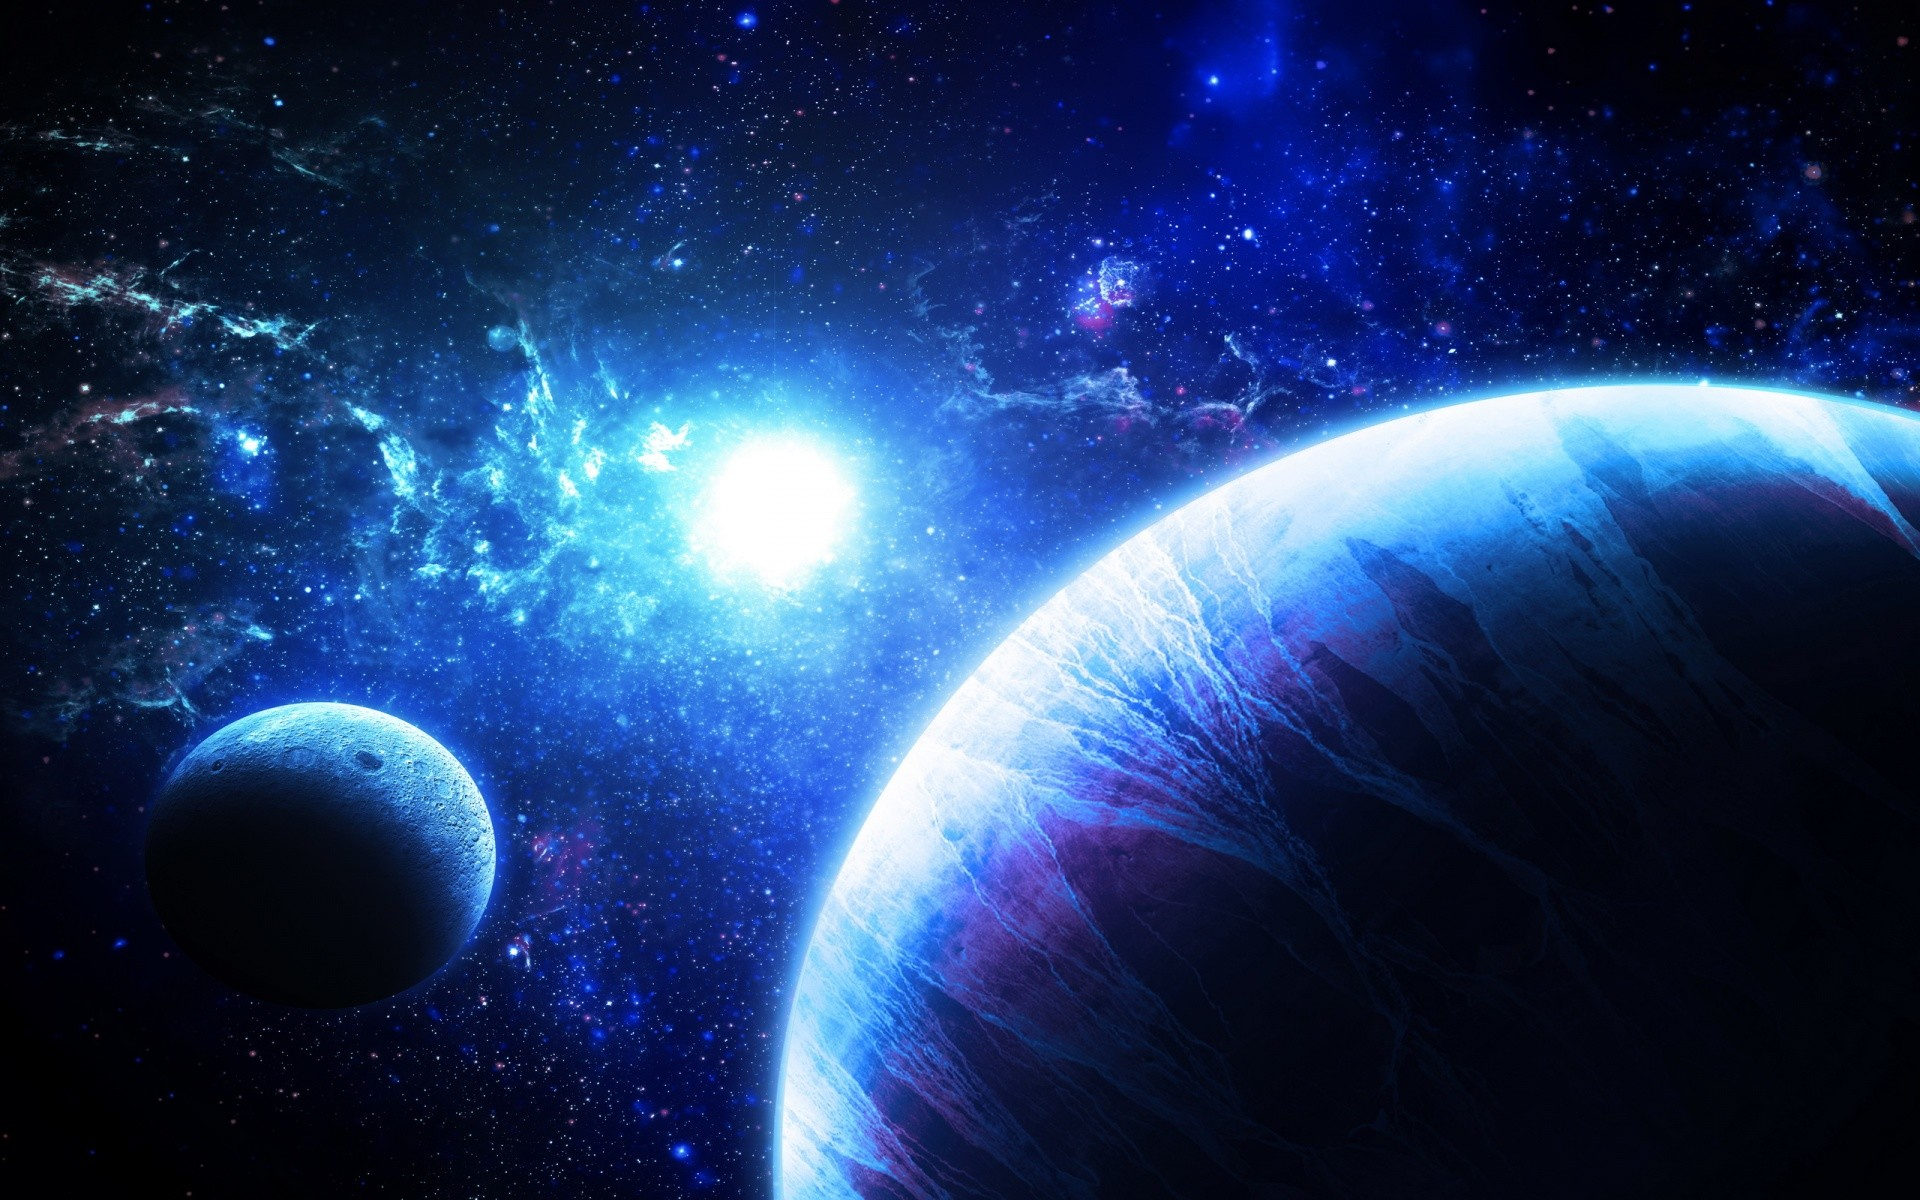 Blue Space. Blue Space Desktop Background